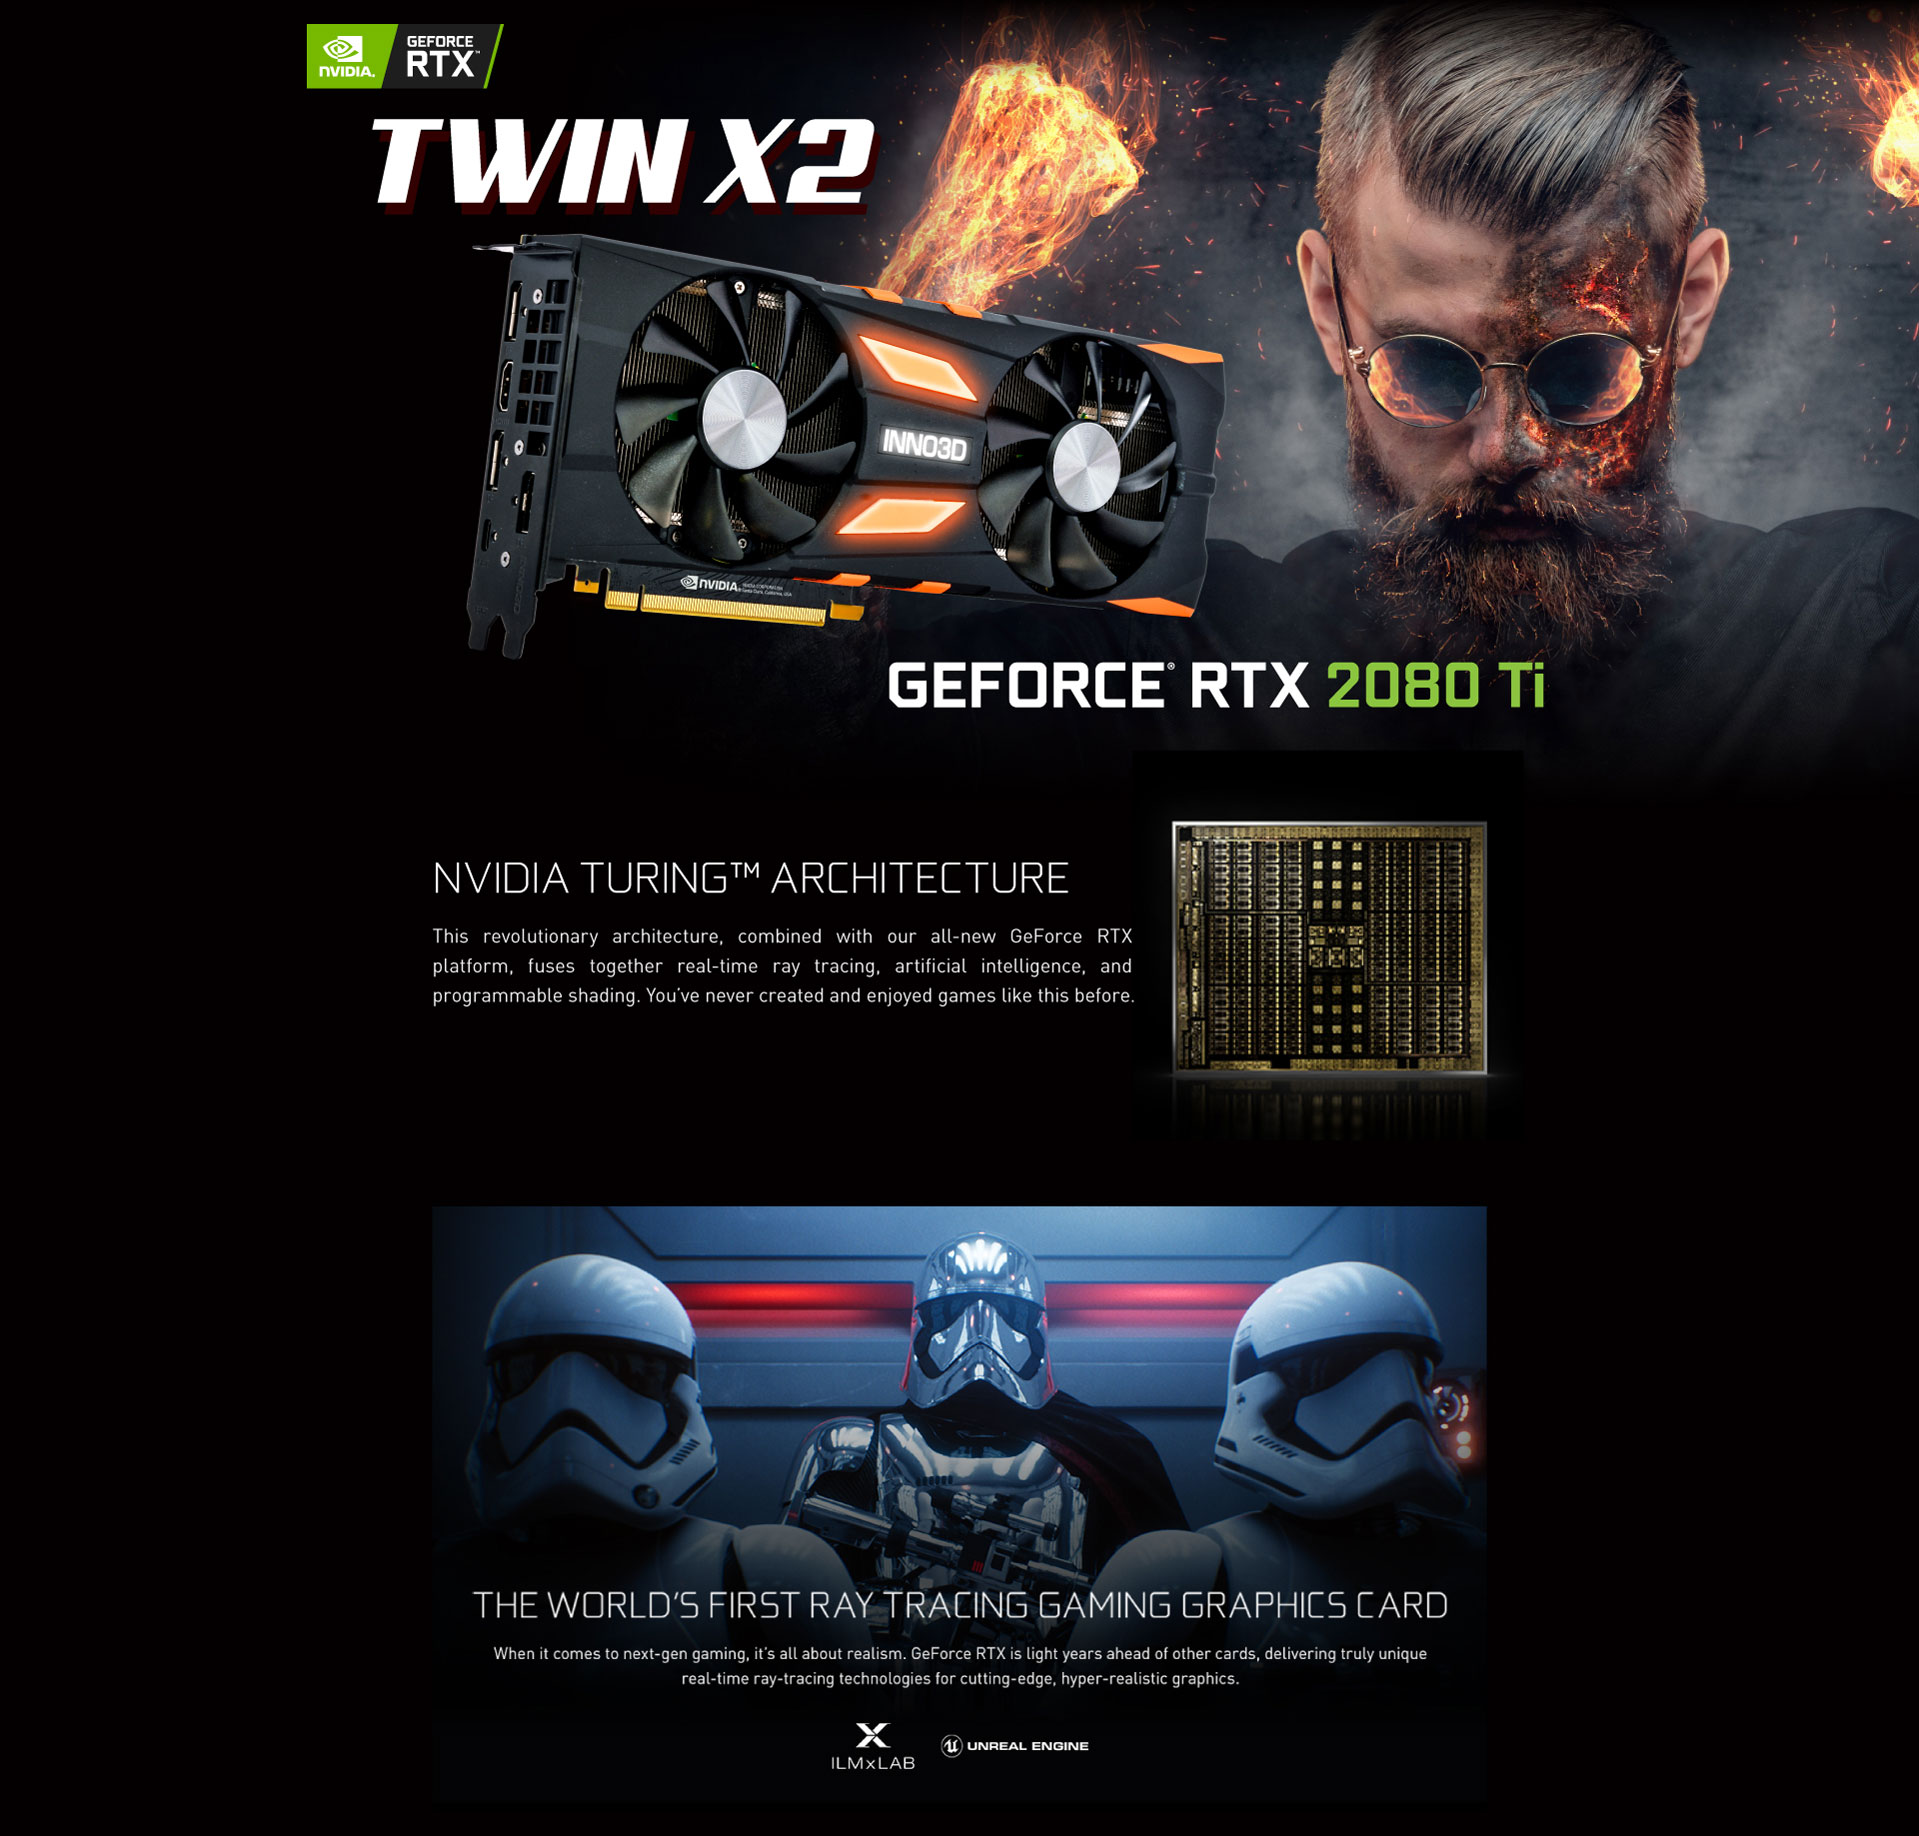 2080Ti_TwinX2_1920w-01.jpg (415 KB)